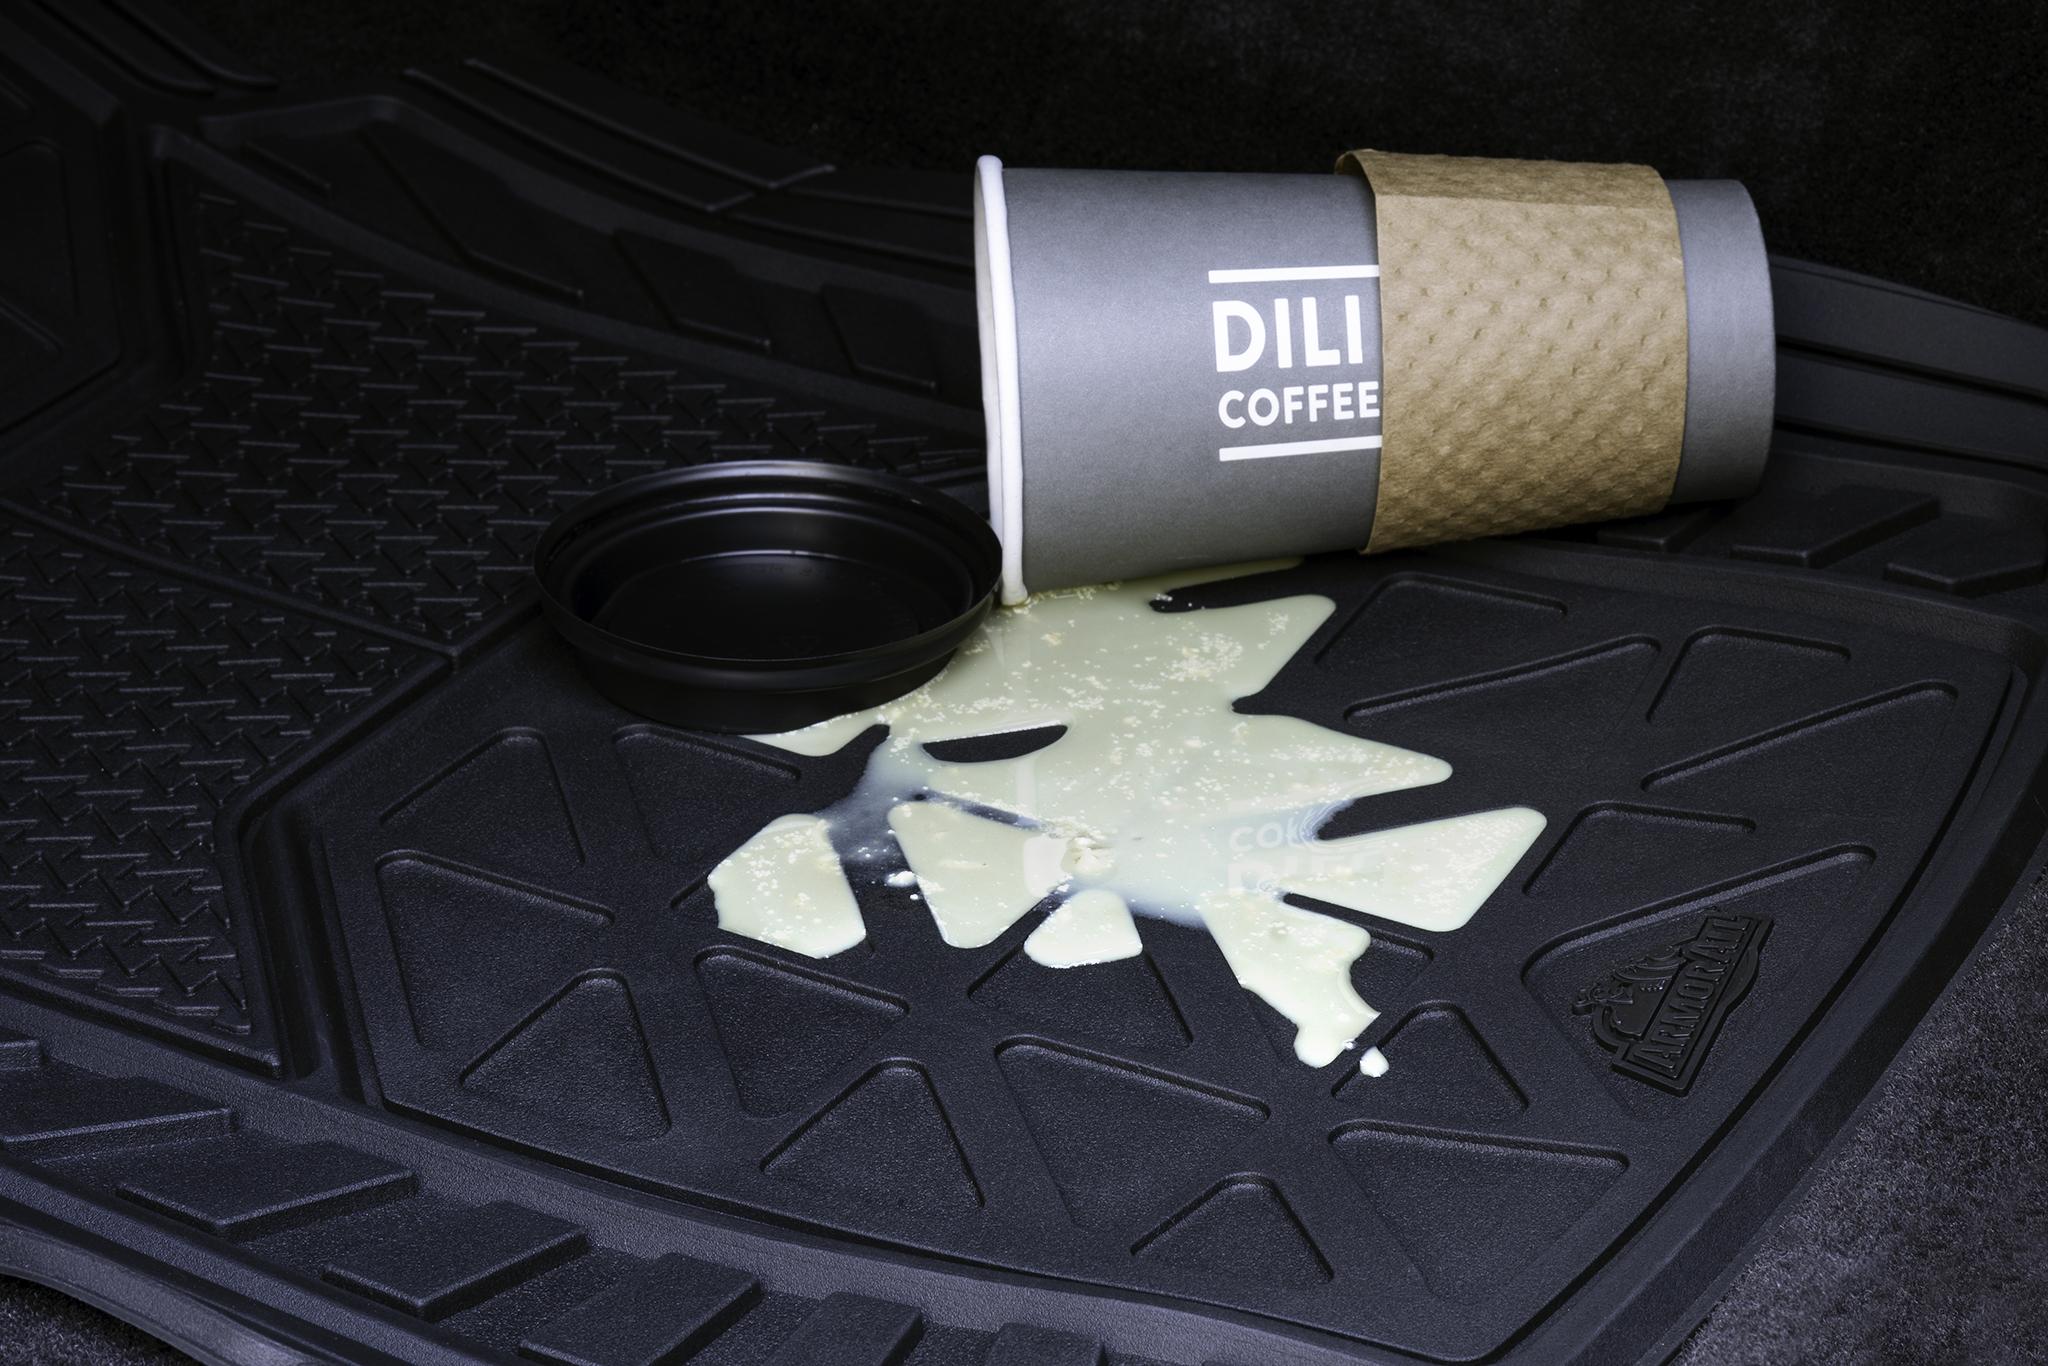 Armor All Floor Mats - Coffee.jpg